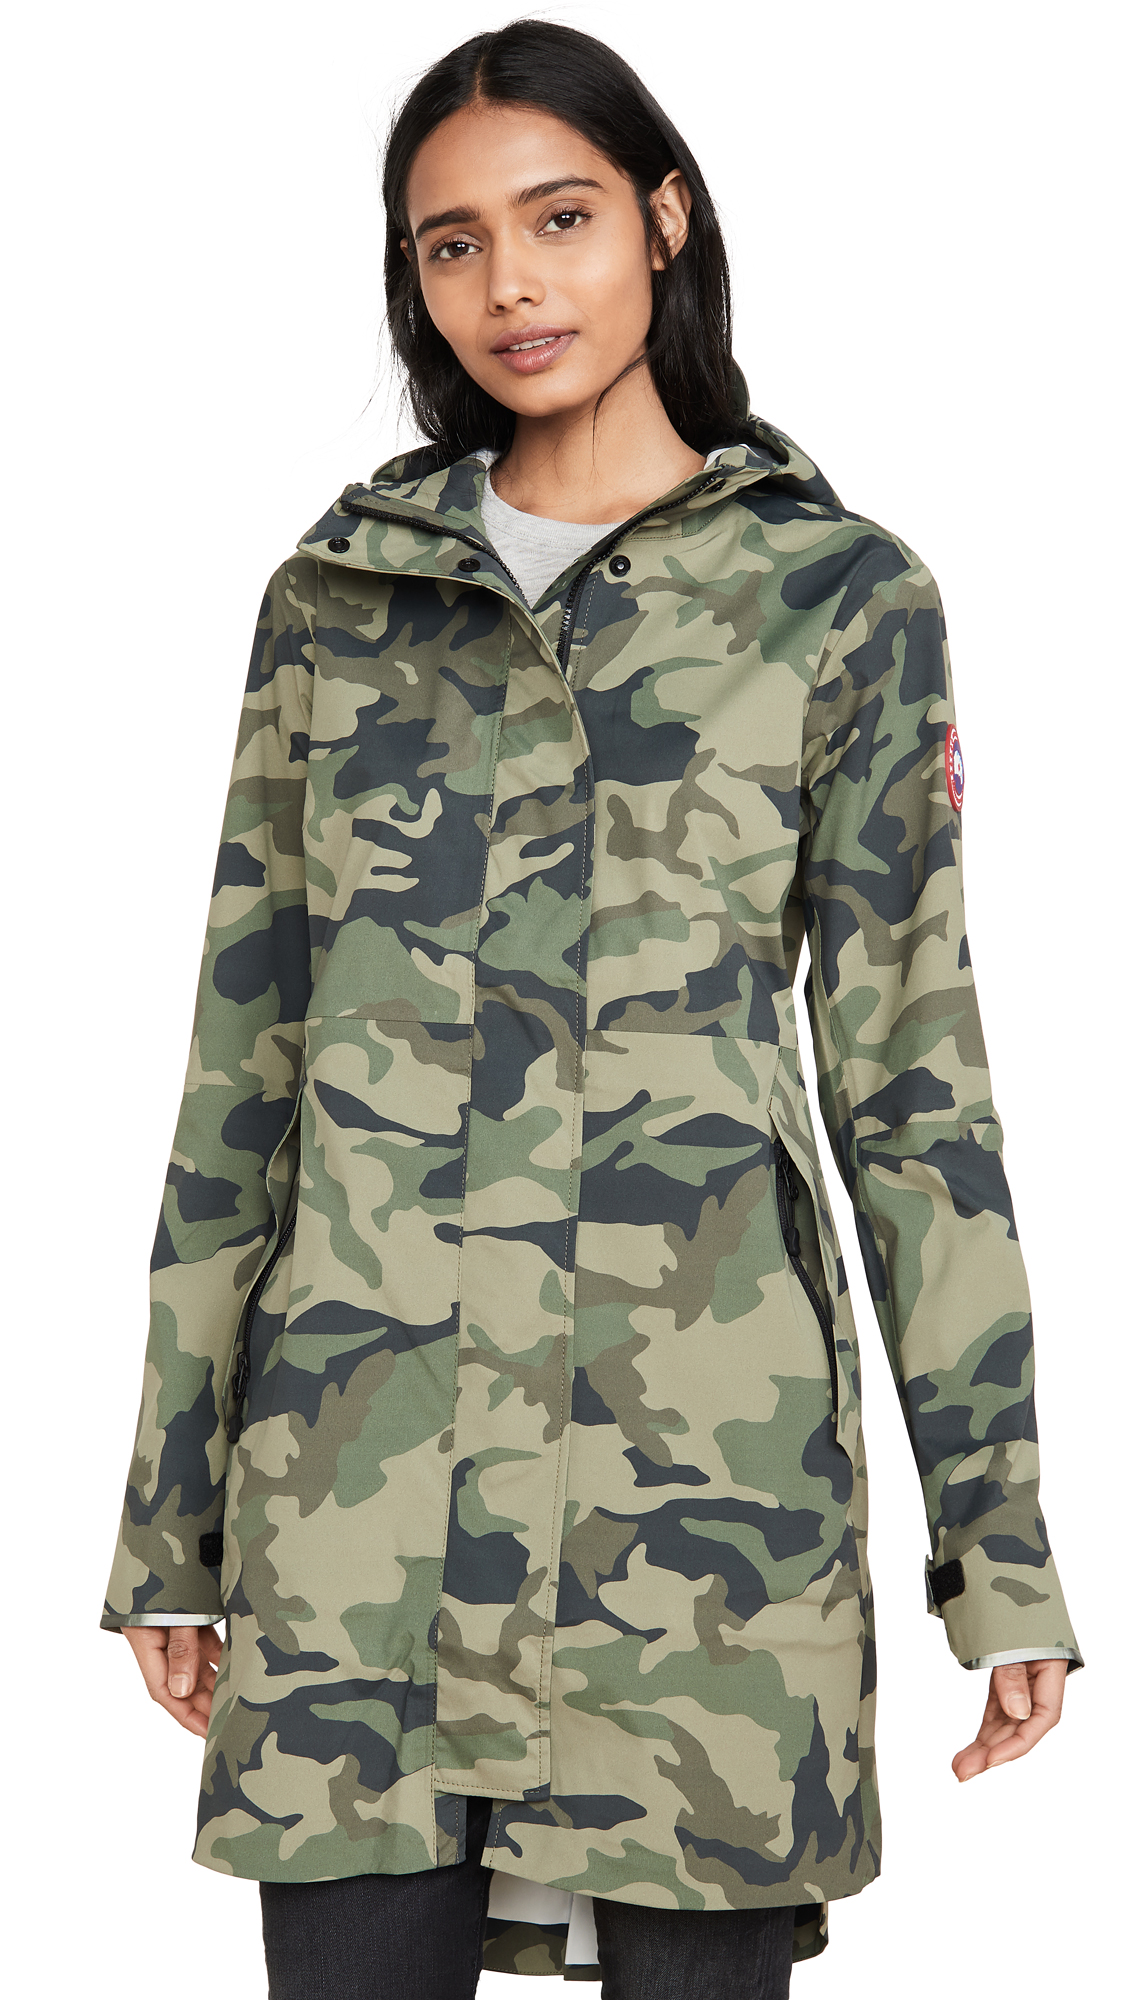 Buy Canada Goose Salida Printed Jacket online beautiful Canada Goose Jackets, Coats, Trench Coats